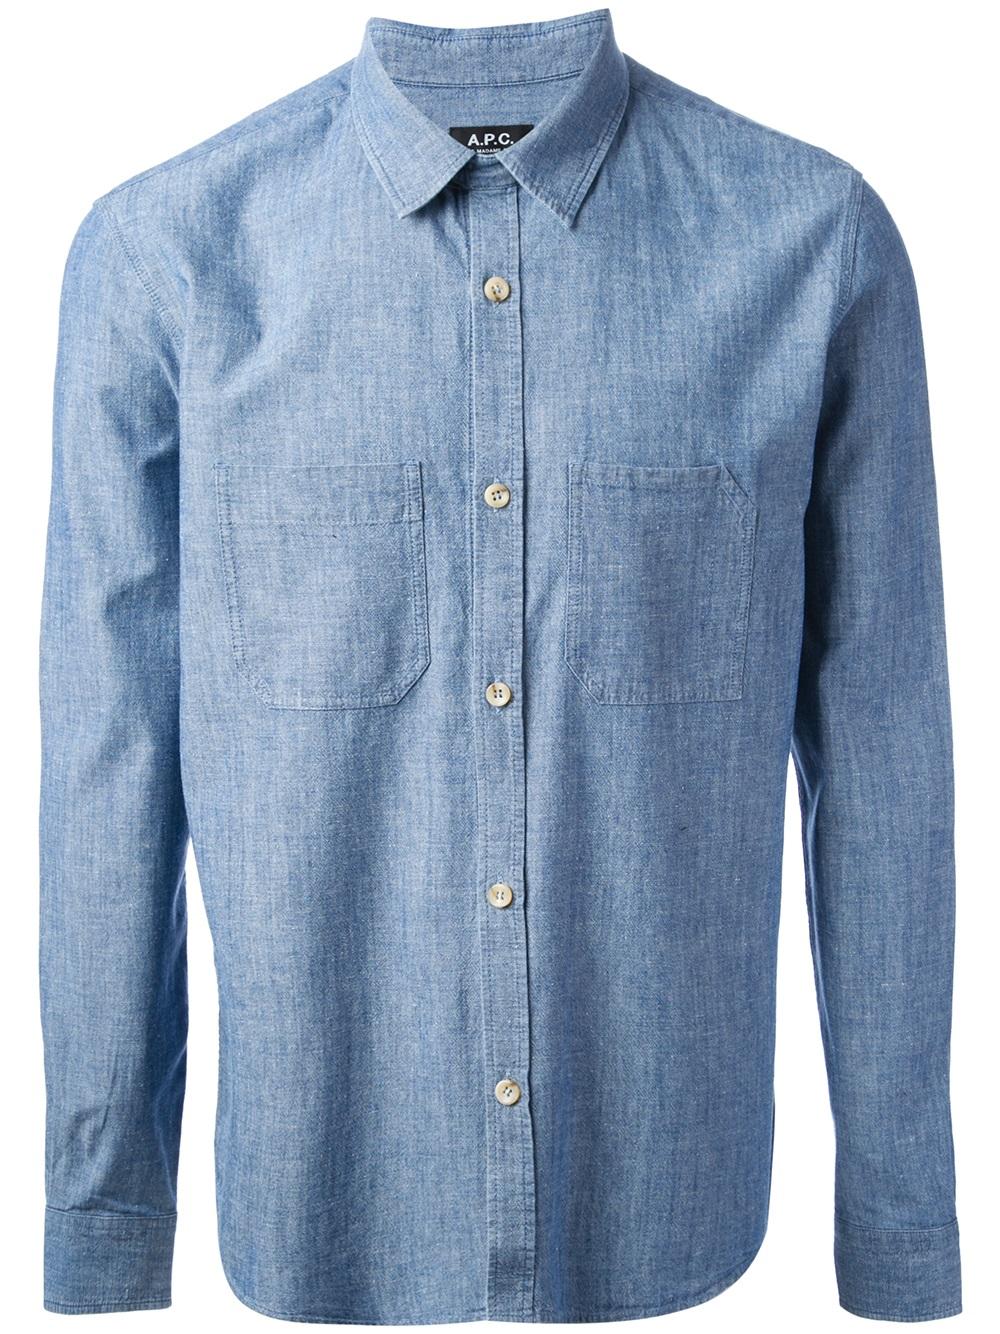 Mens Work Shirts Short Sleeve